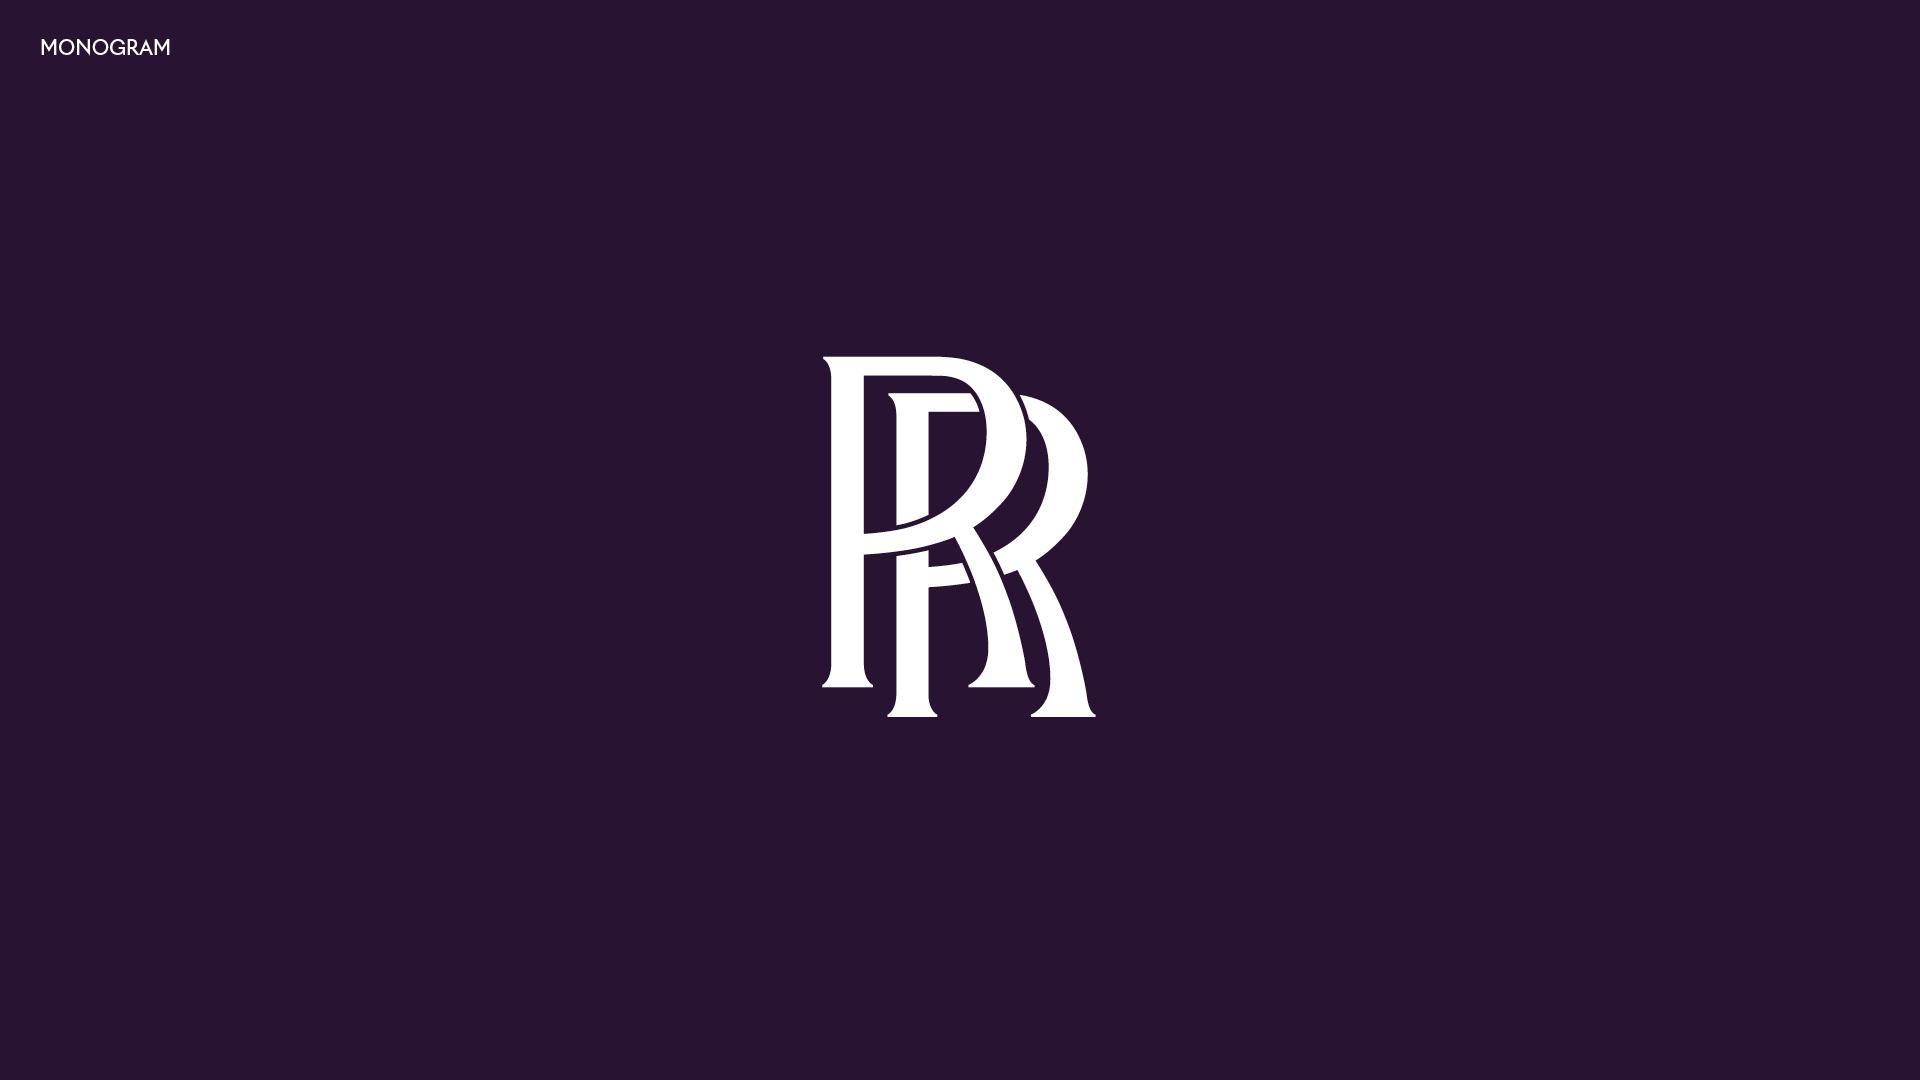 Rolls-Royce monogram